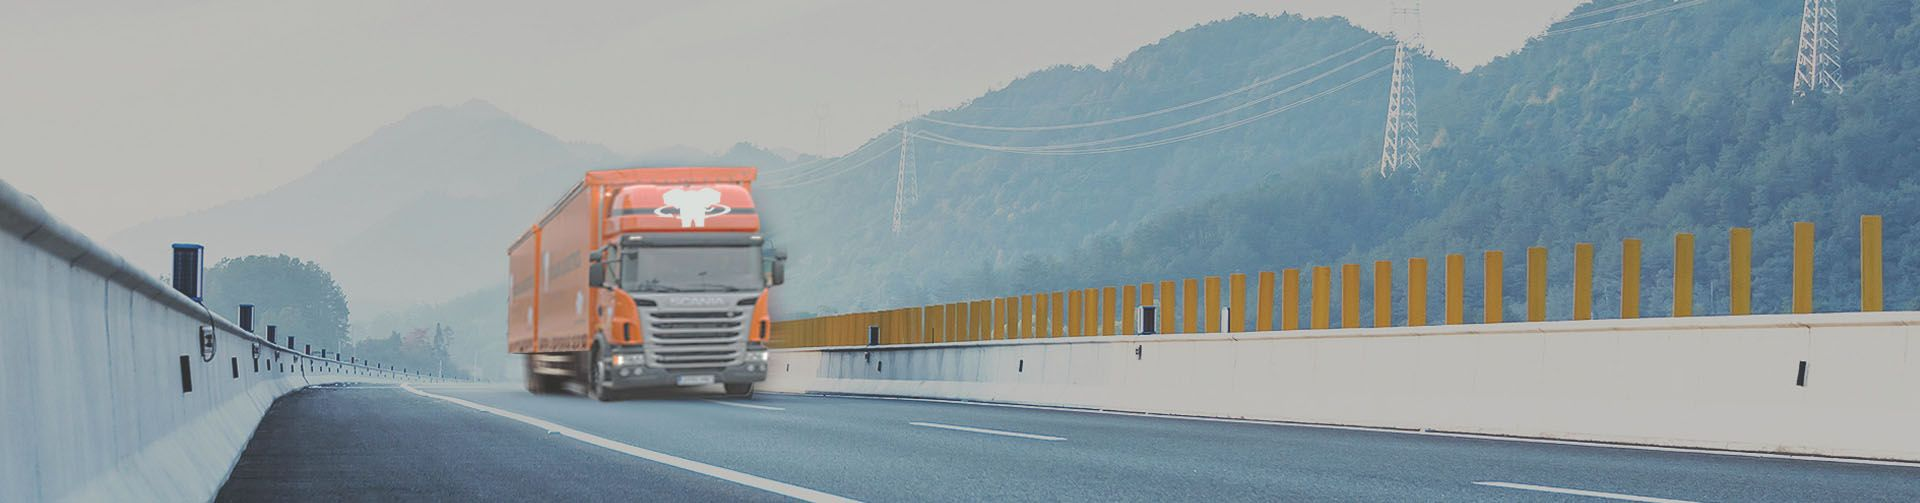 transporte-gran-volumen